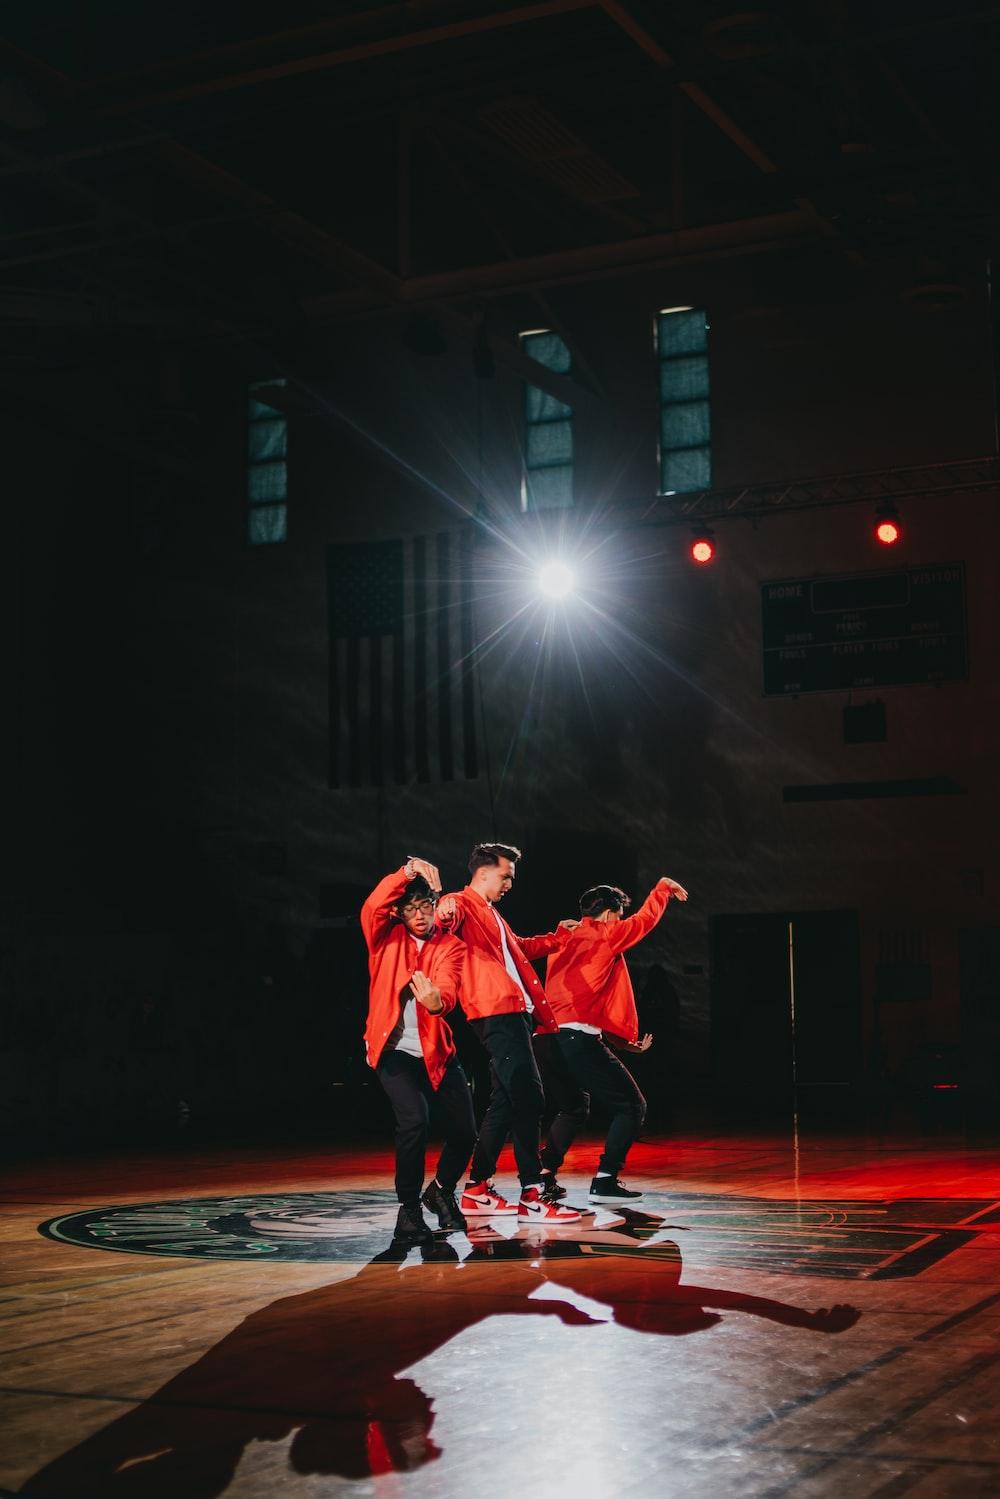 men dancing on stage